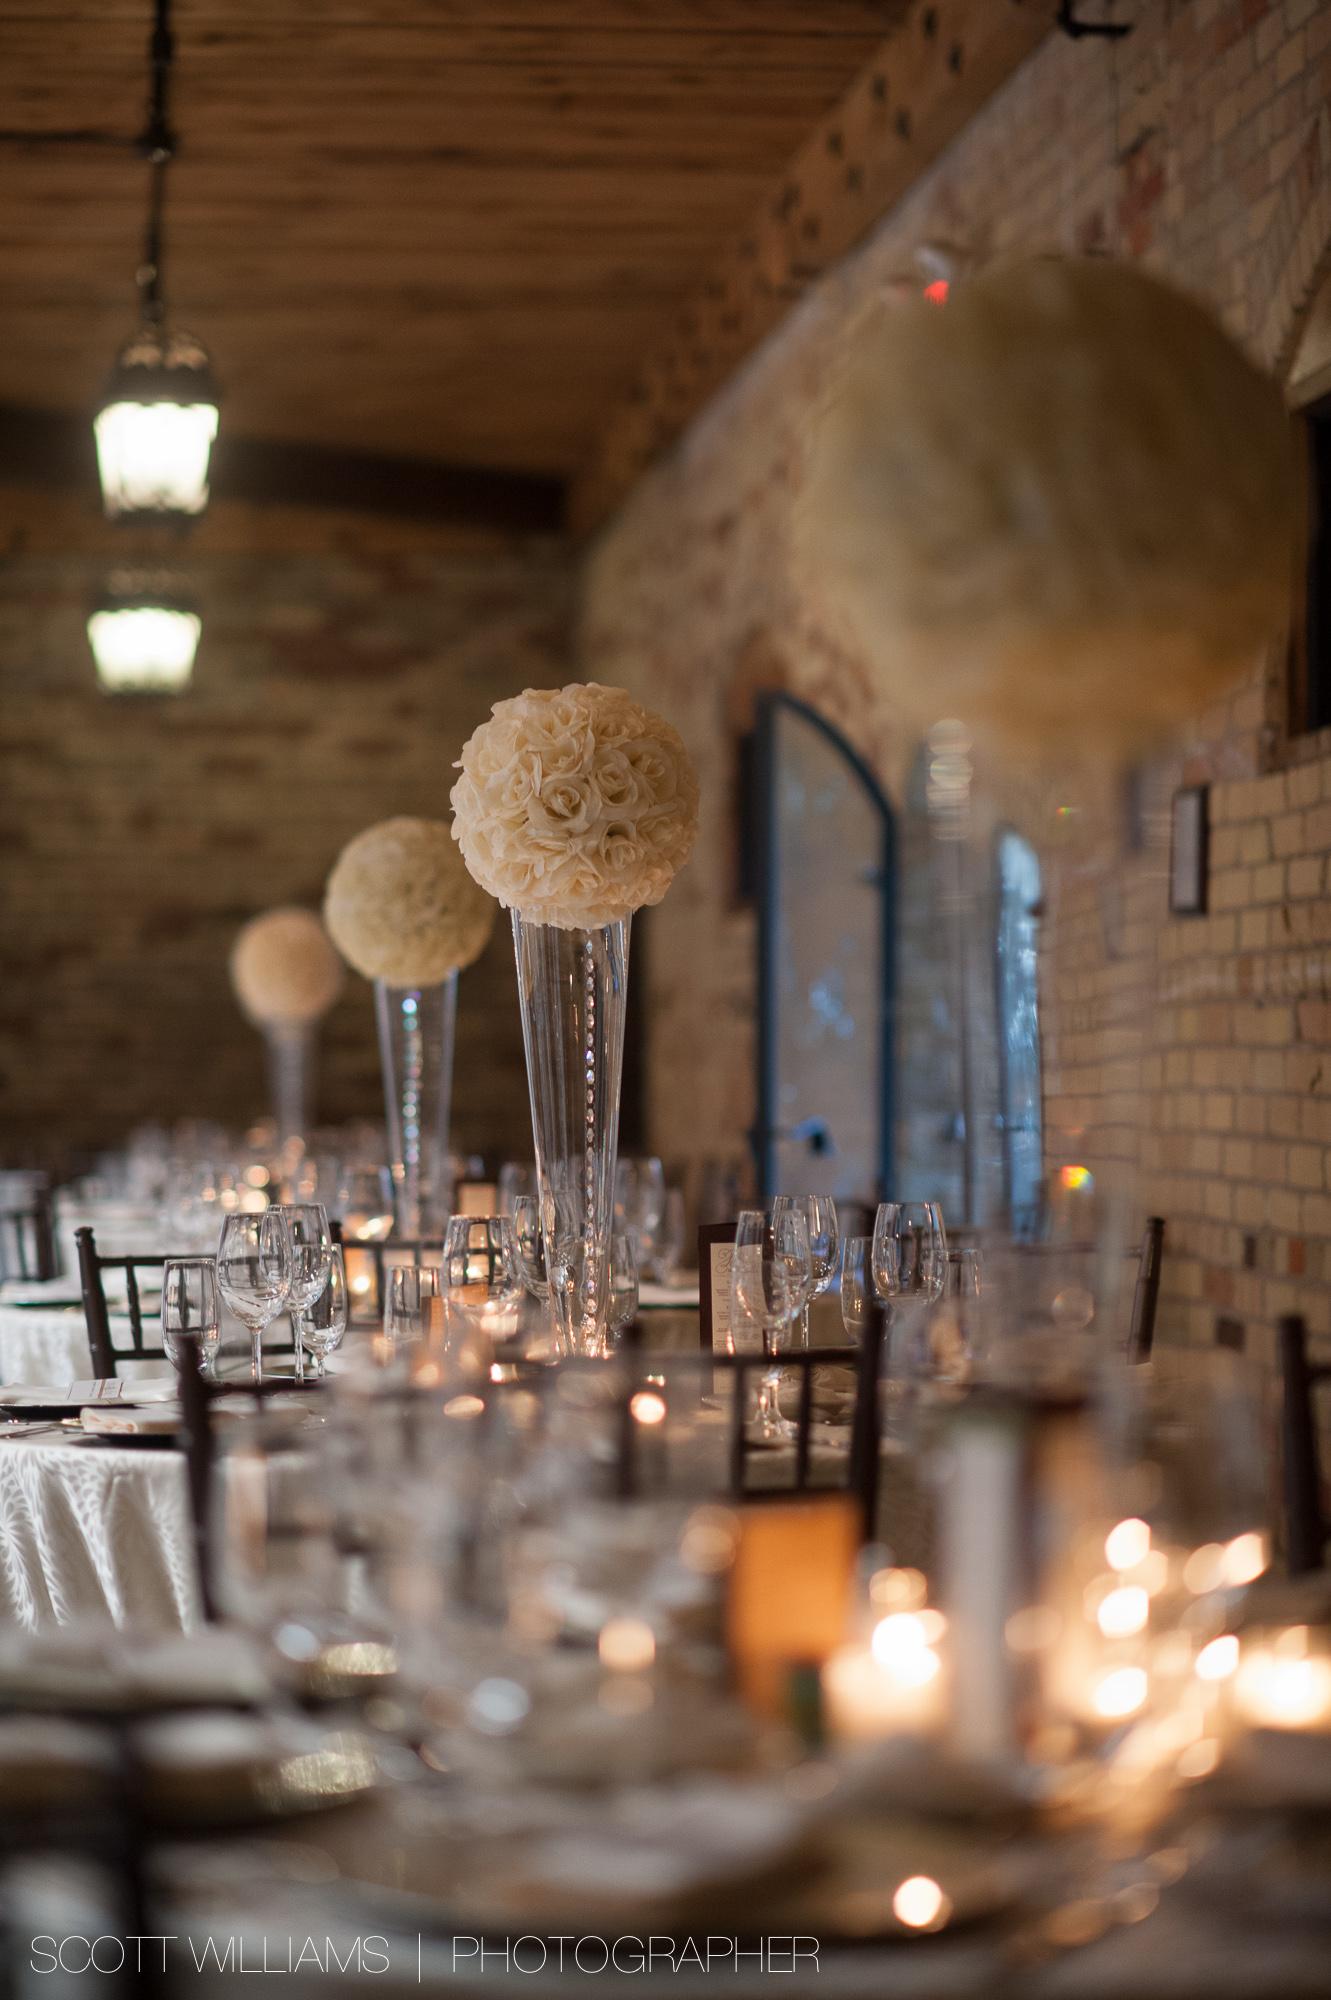 hacienda-sarria-kitchener-wedding-005.jpg